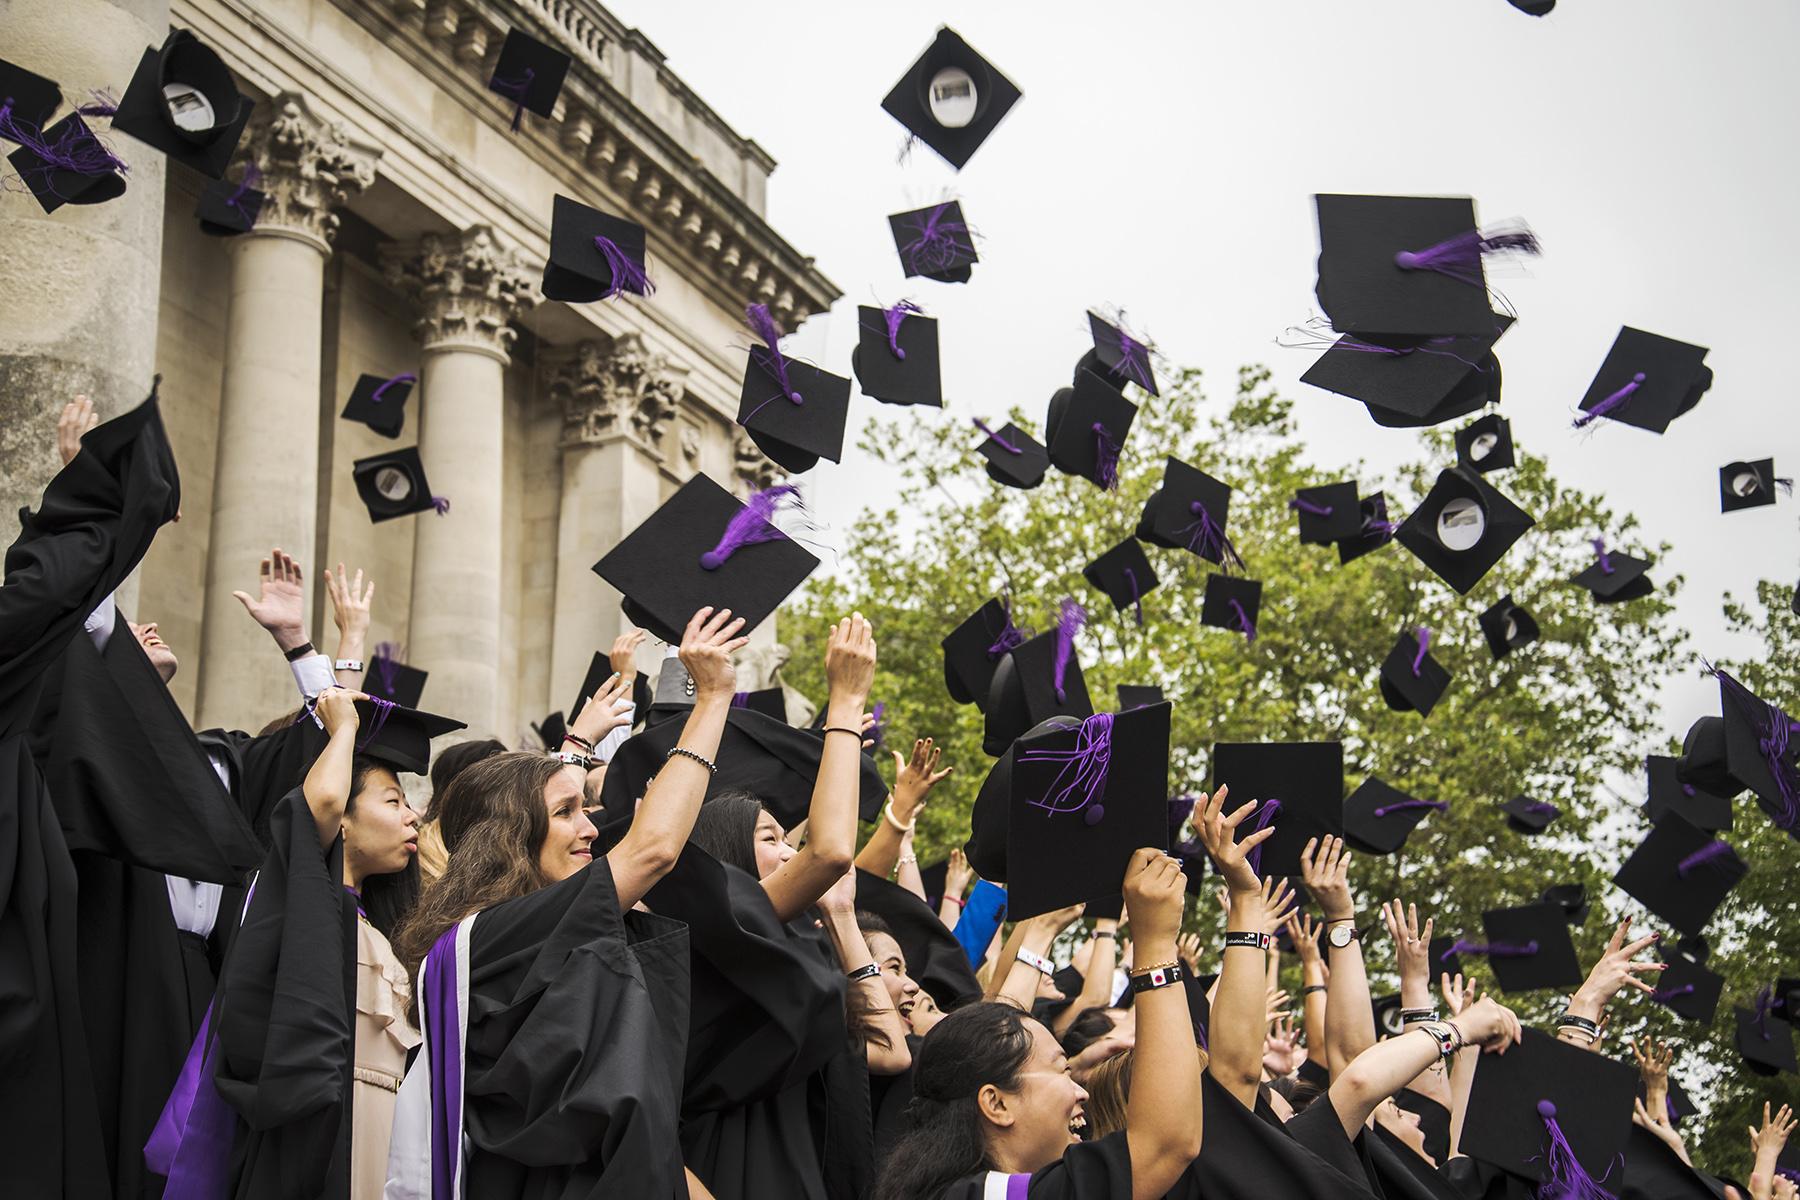 A graduation ceremony at Portsmouth University